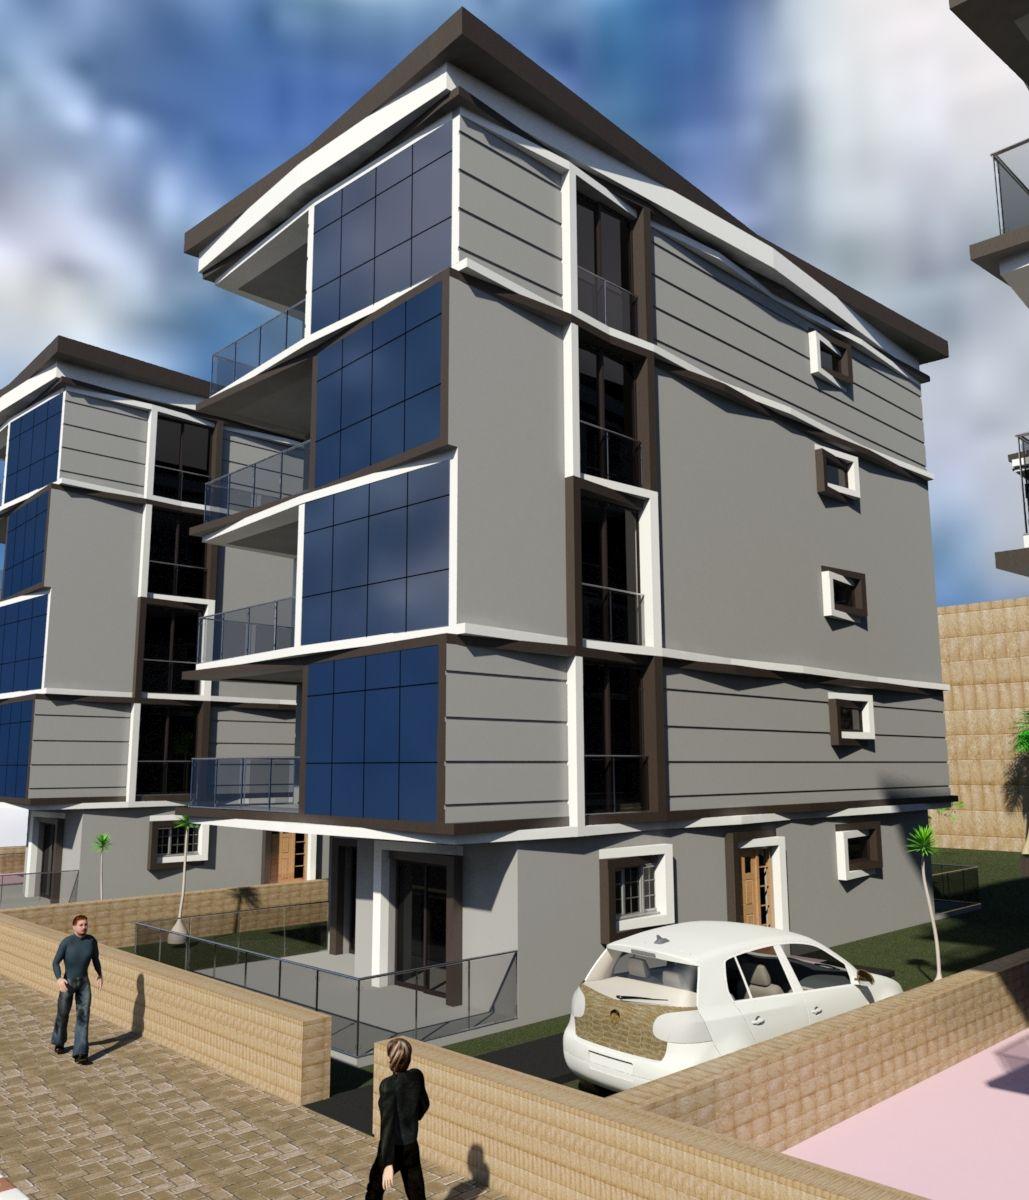 Architectural Exterior Residential Aparment Building Design İzmir   Turkey  By Mümin Bayar